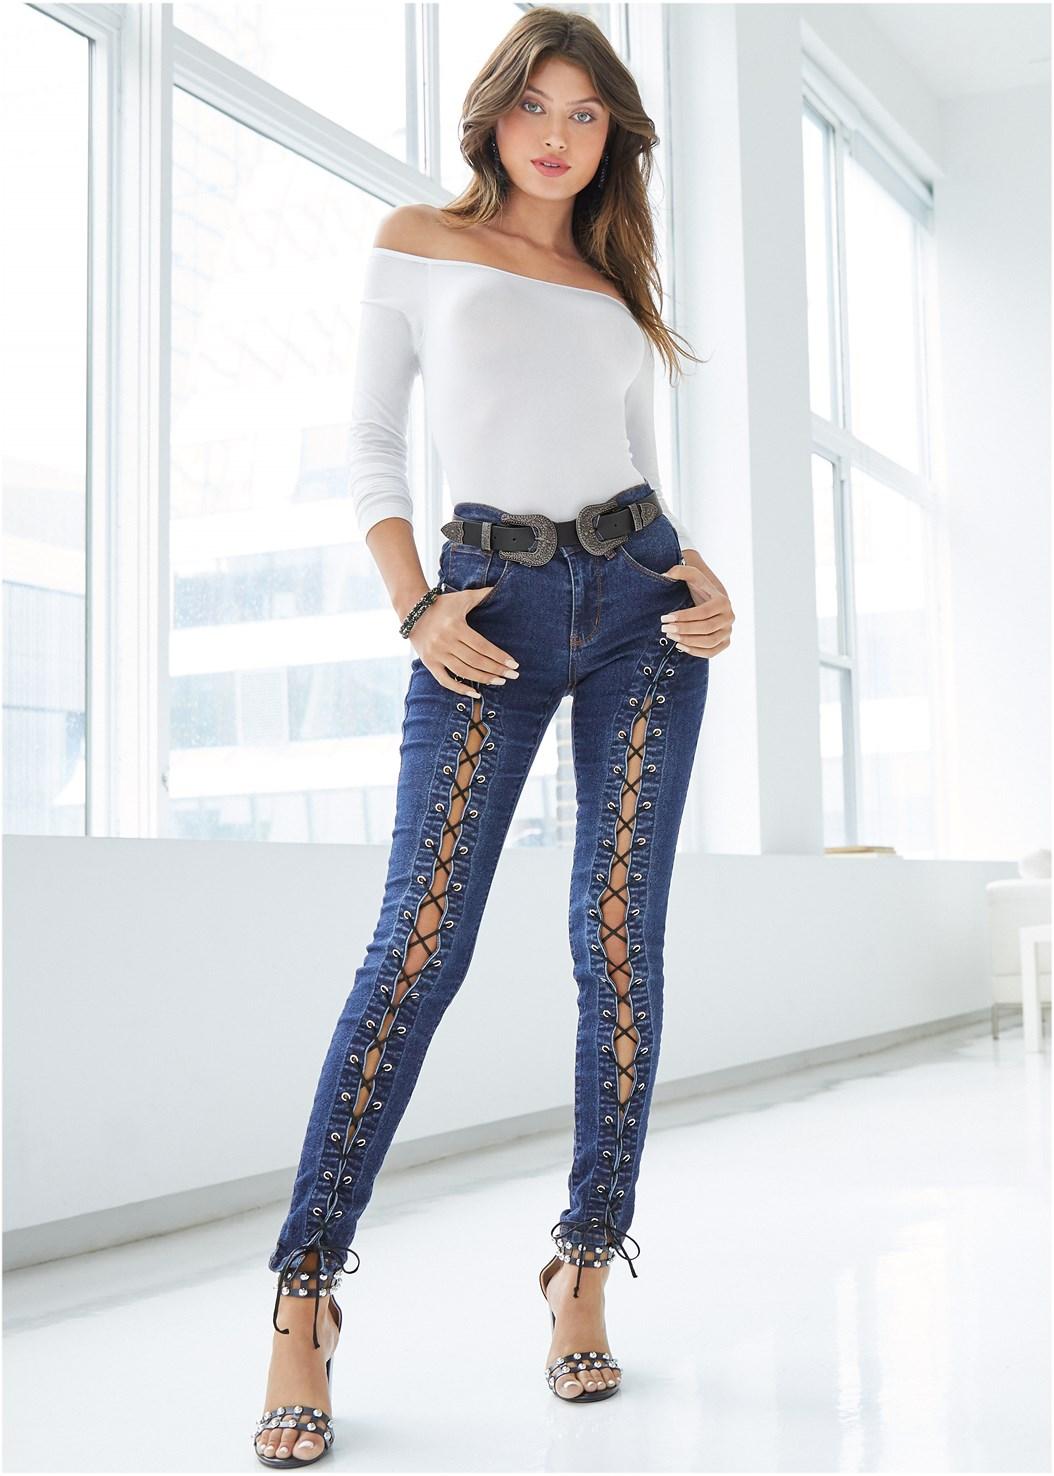 Lace Up Skinny Jeans,Off The Shoulder Top,Double Buckle Belt,Beaded Tassel Earrings